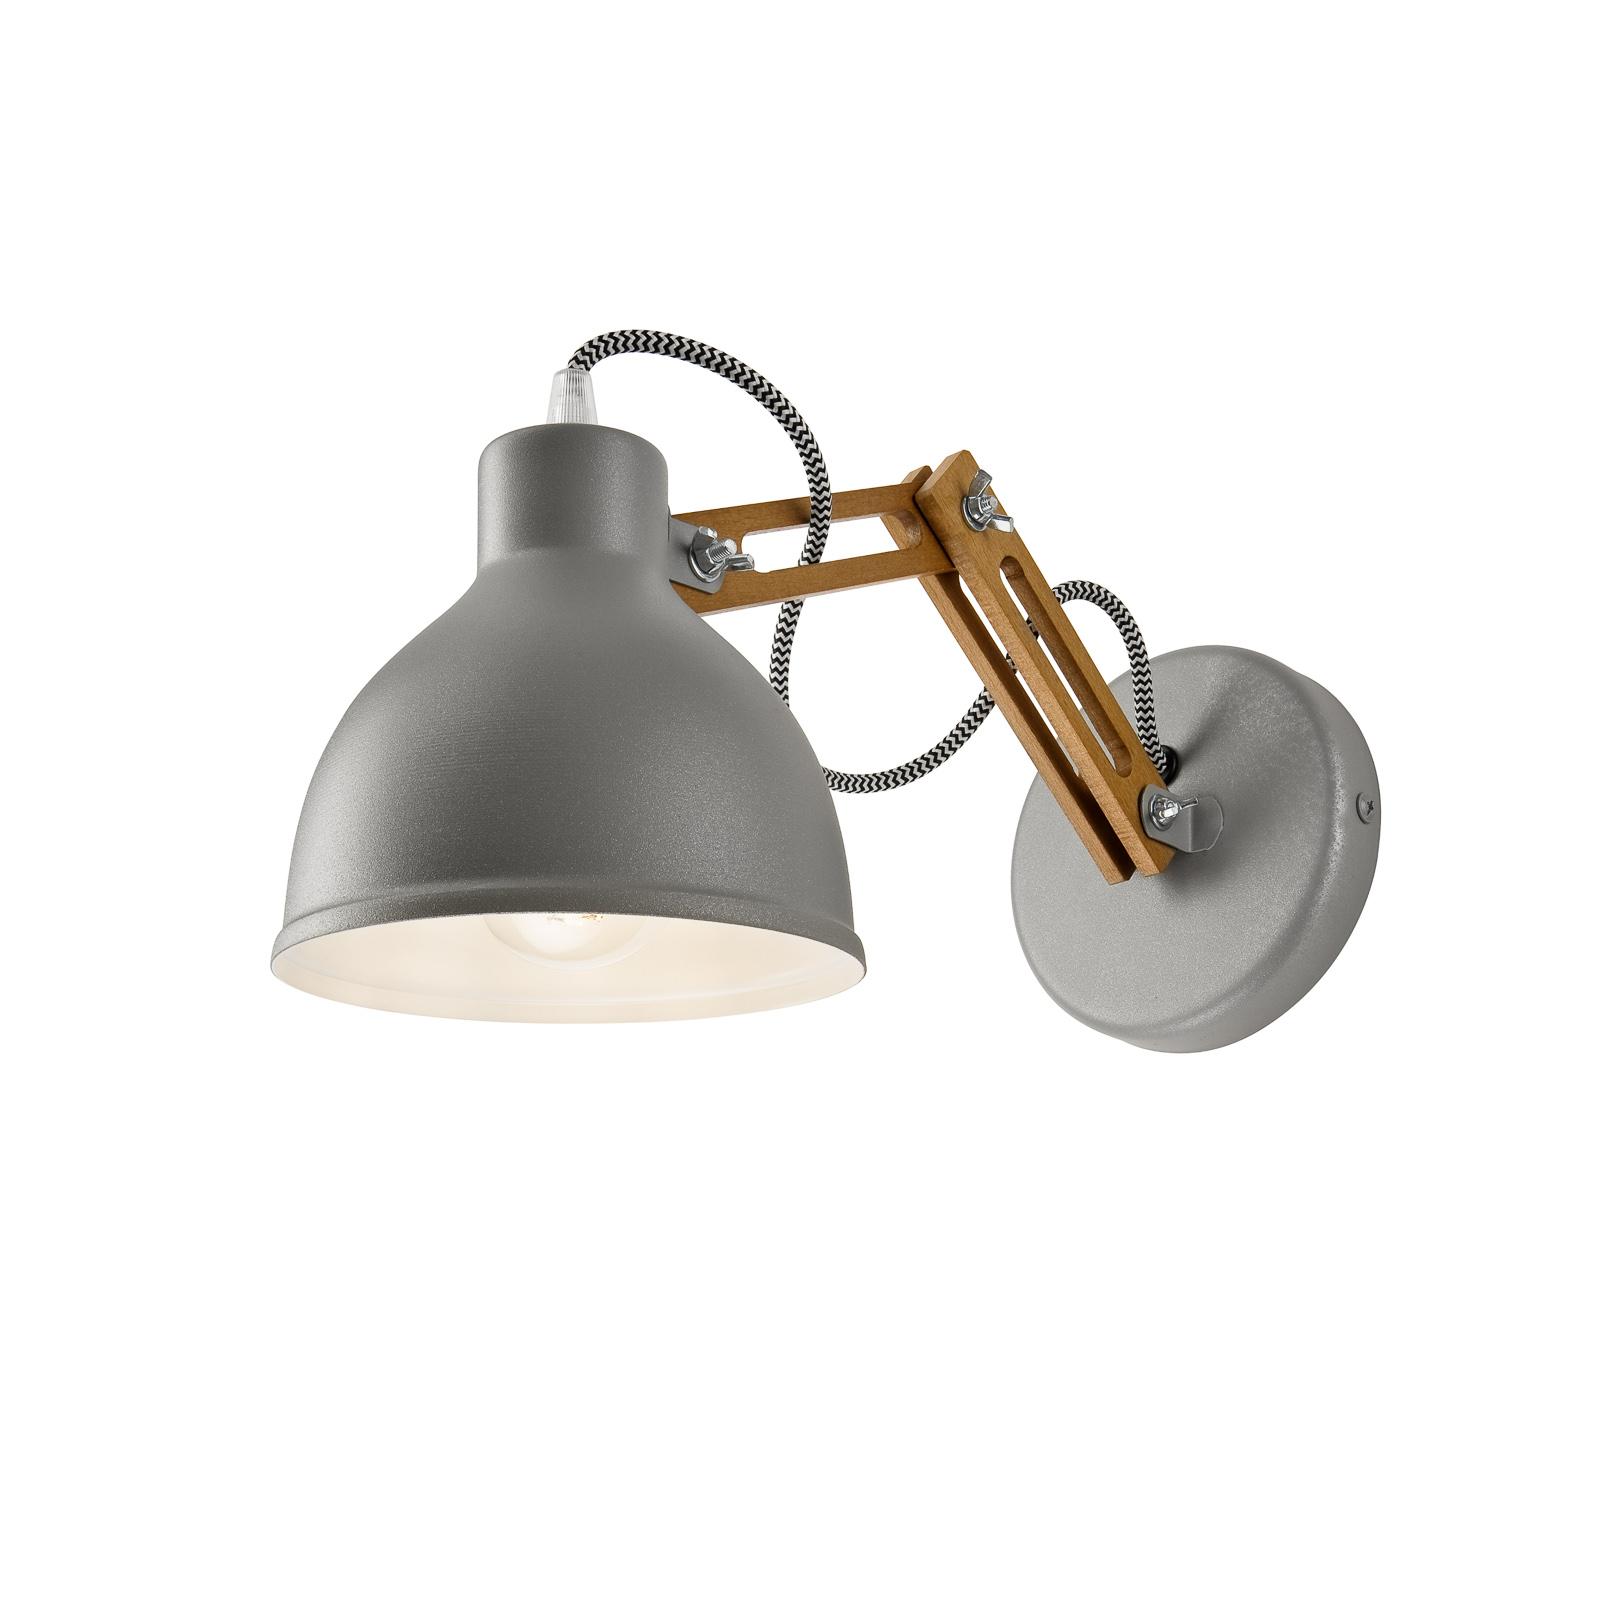 Wandlampe Skansen, Holzarm verstellbar, grau